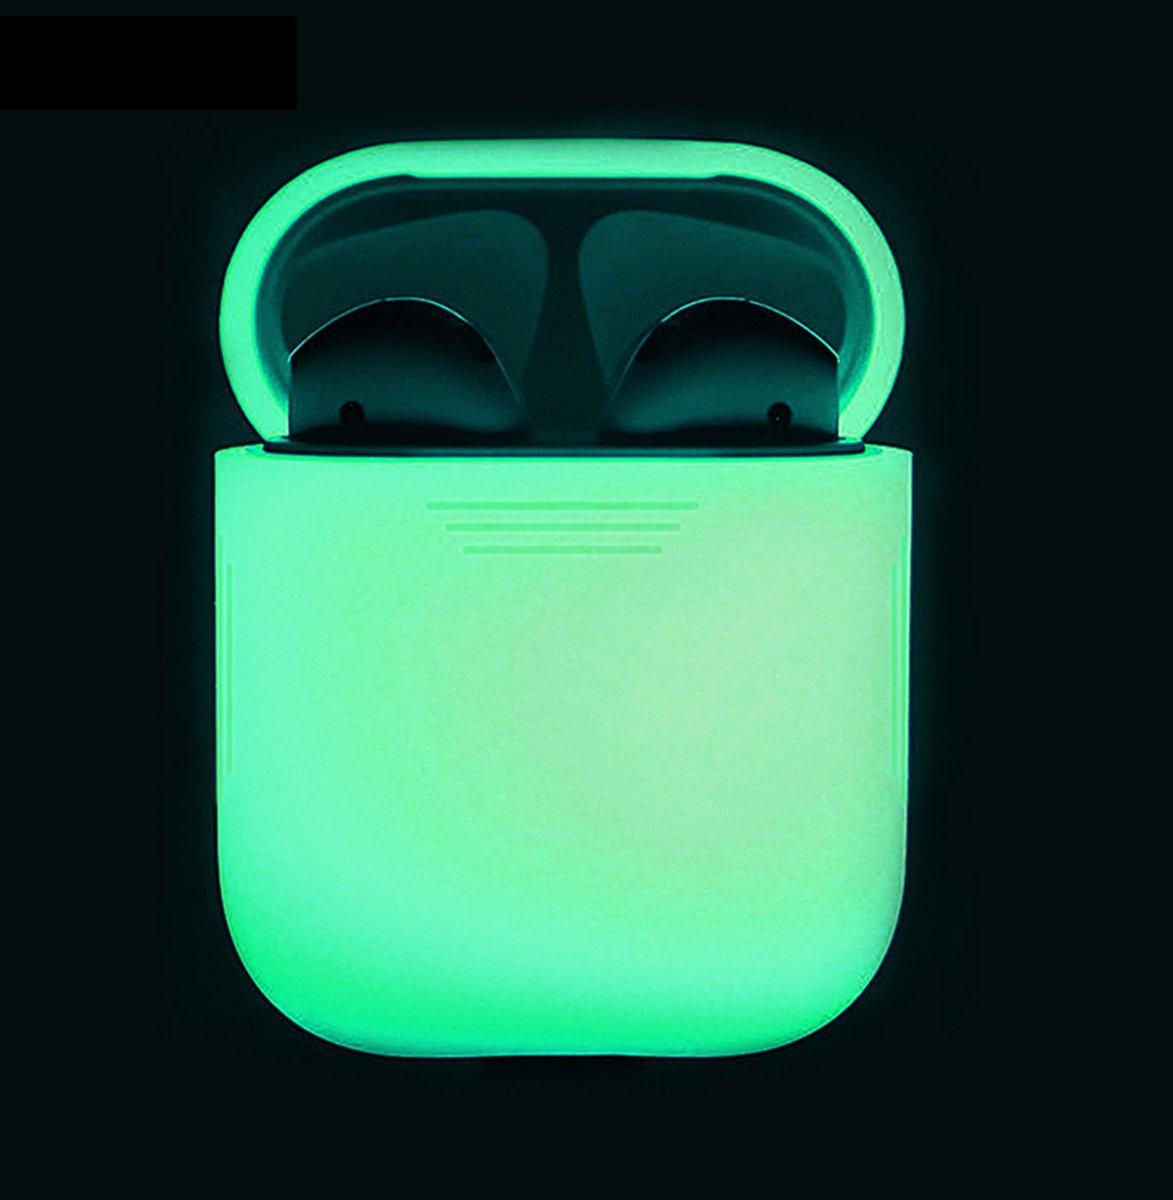 Silicone Case Cover Hoesje voor Apple Airpods - Wit/Glow in the dark kopen